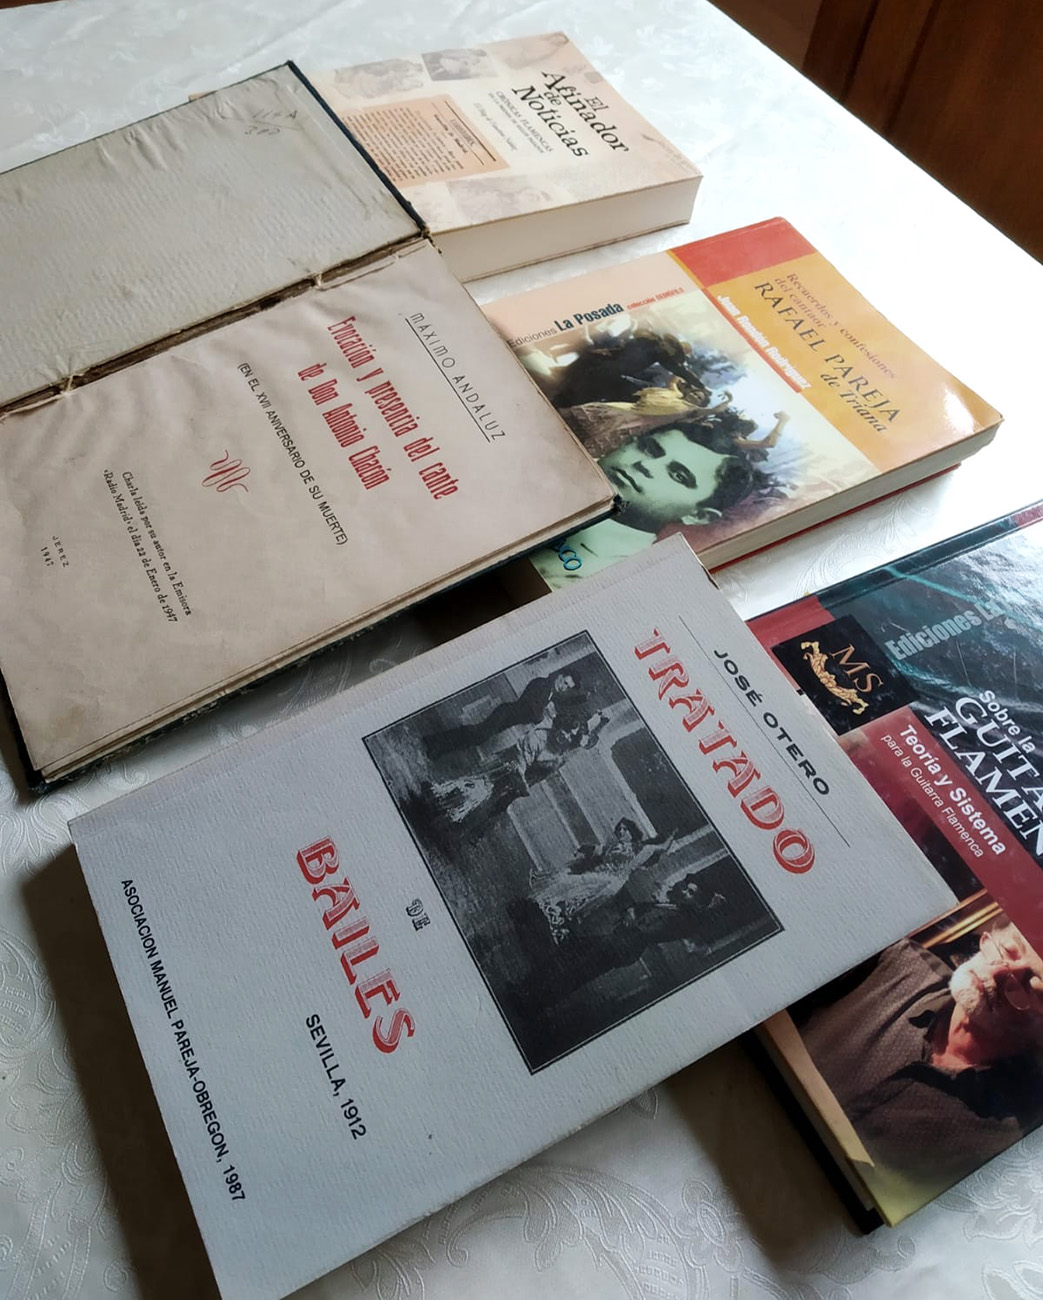 Lecturas flamencas de un confinado. Por Manuel Bohórquez.